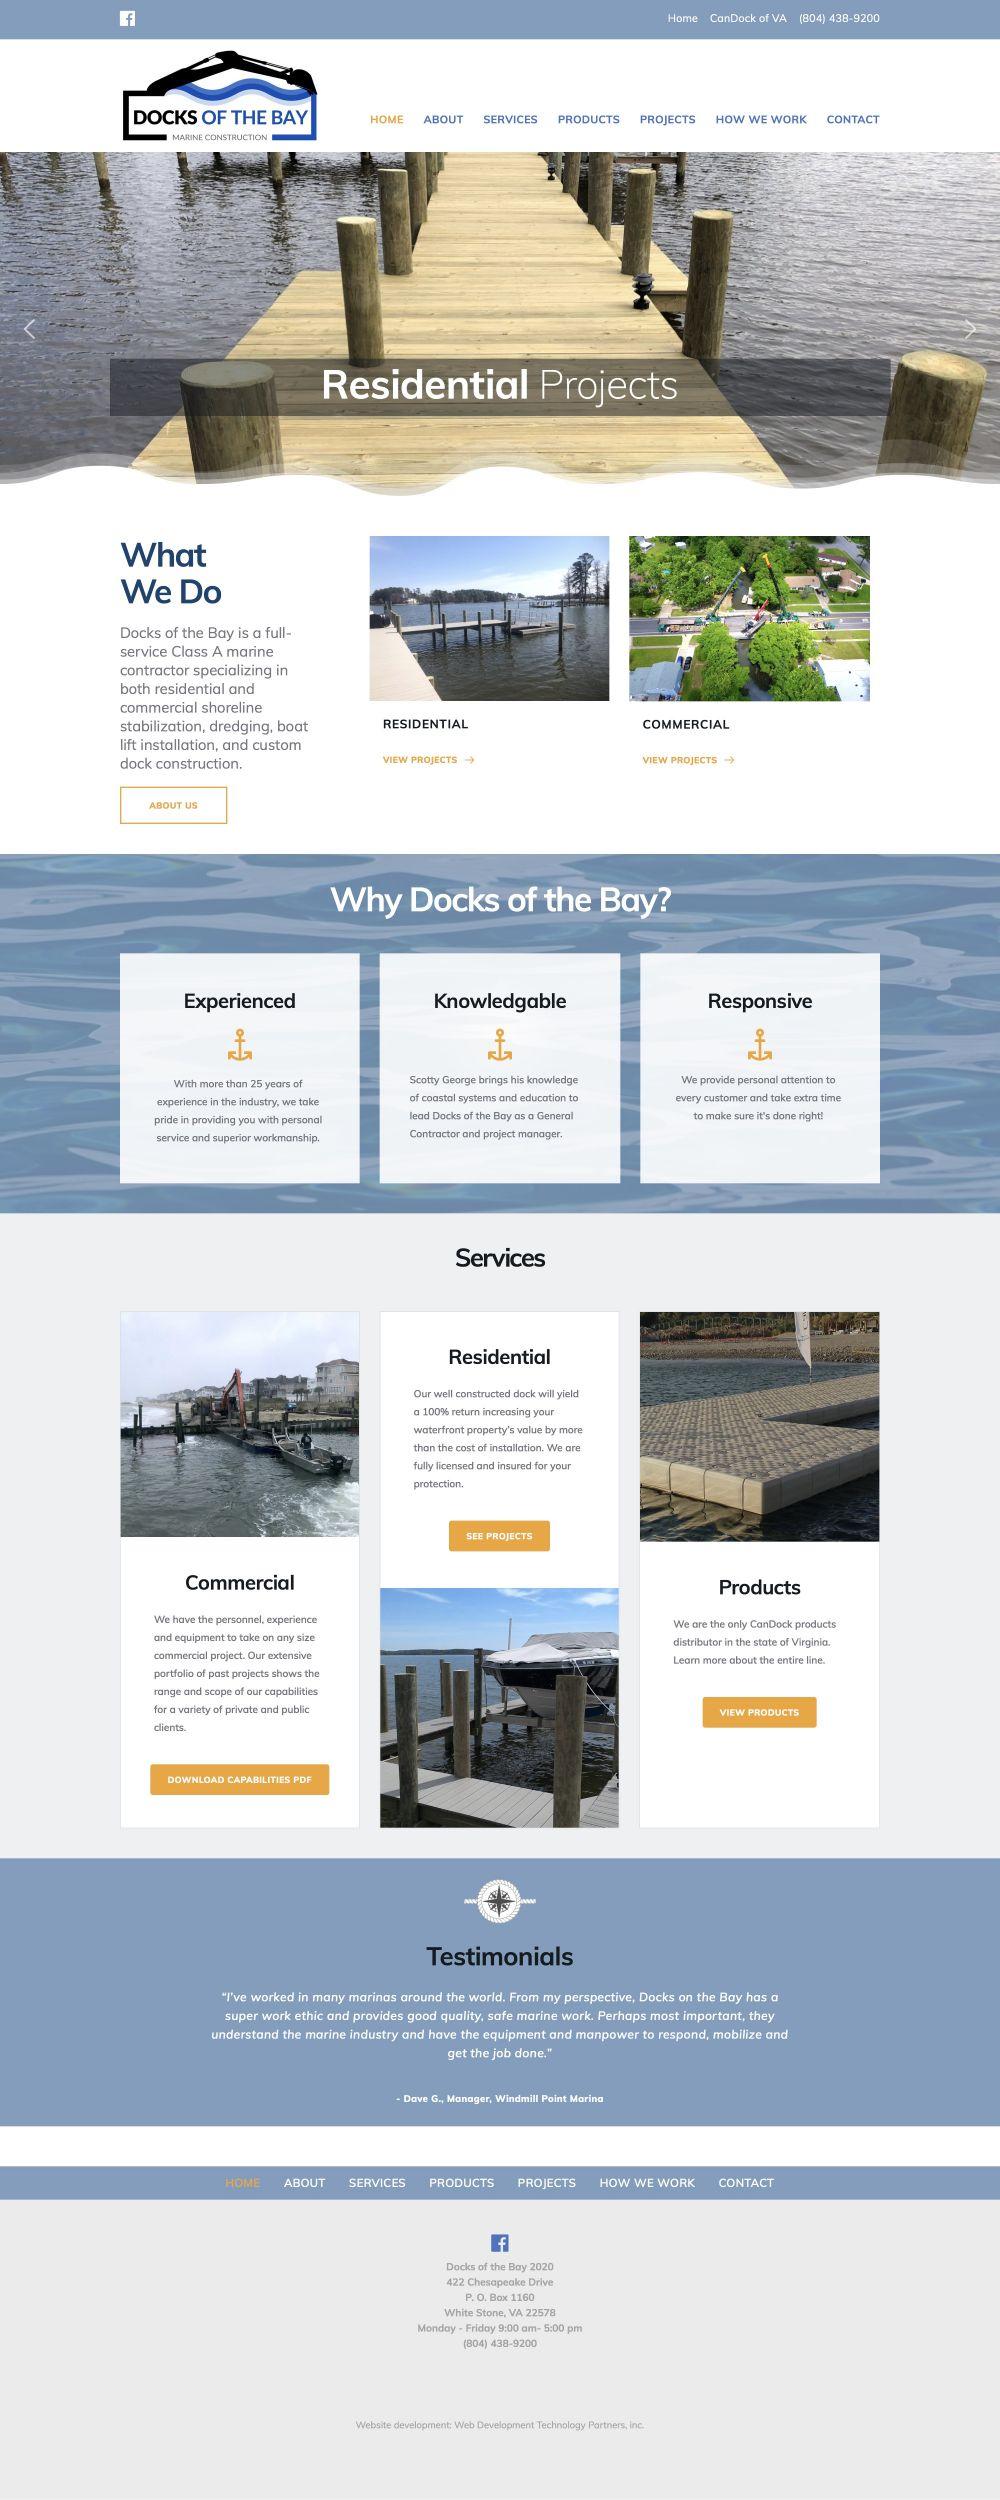 Docks of the Bay 2020